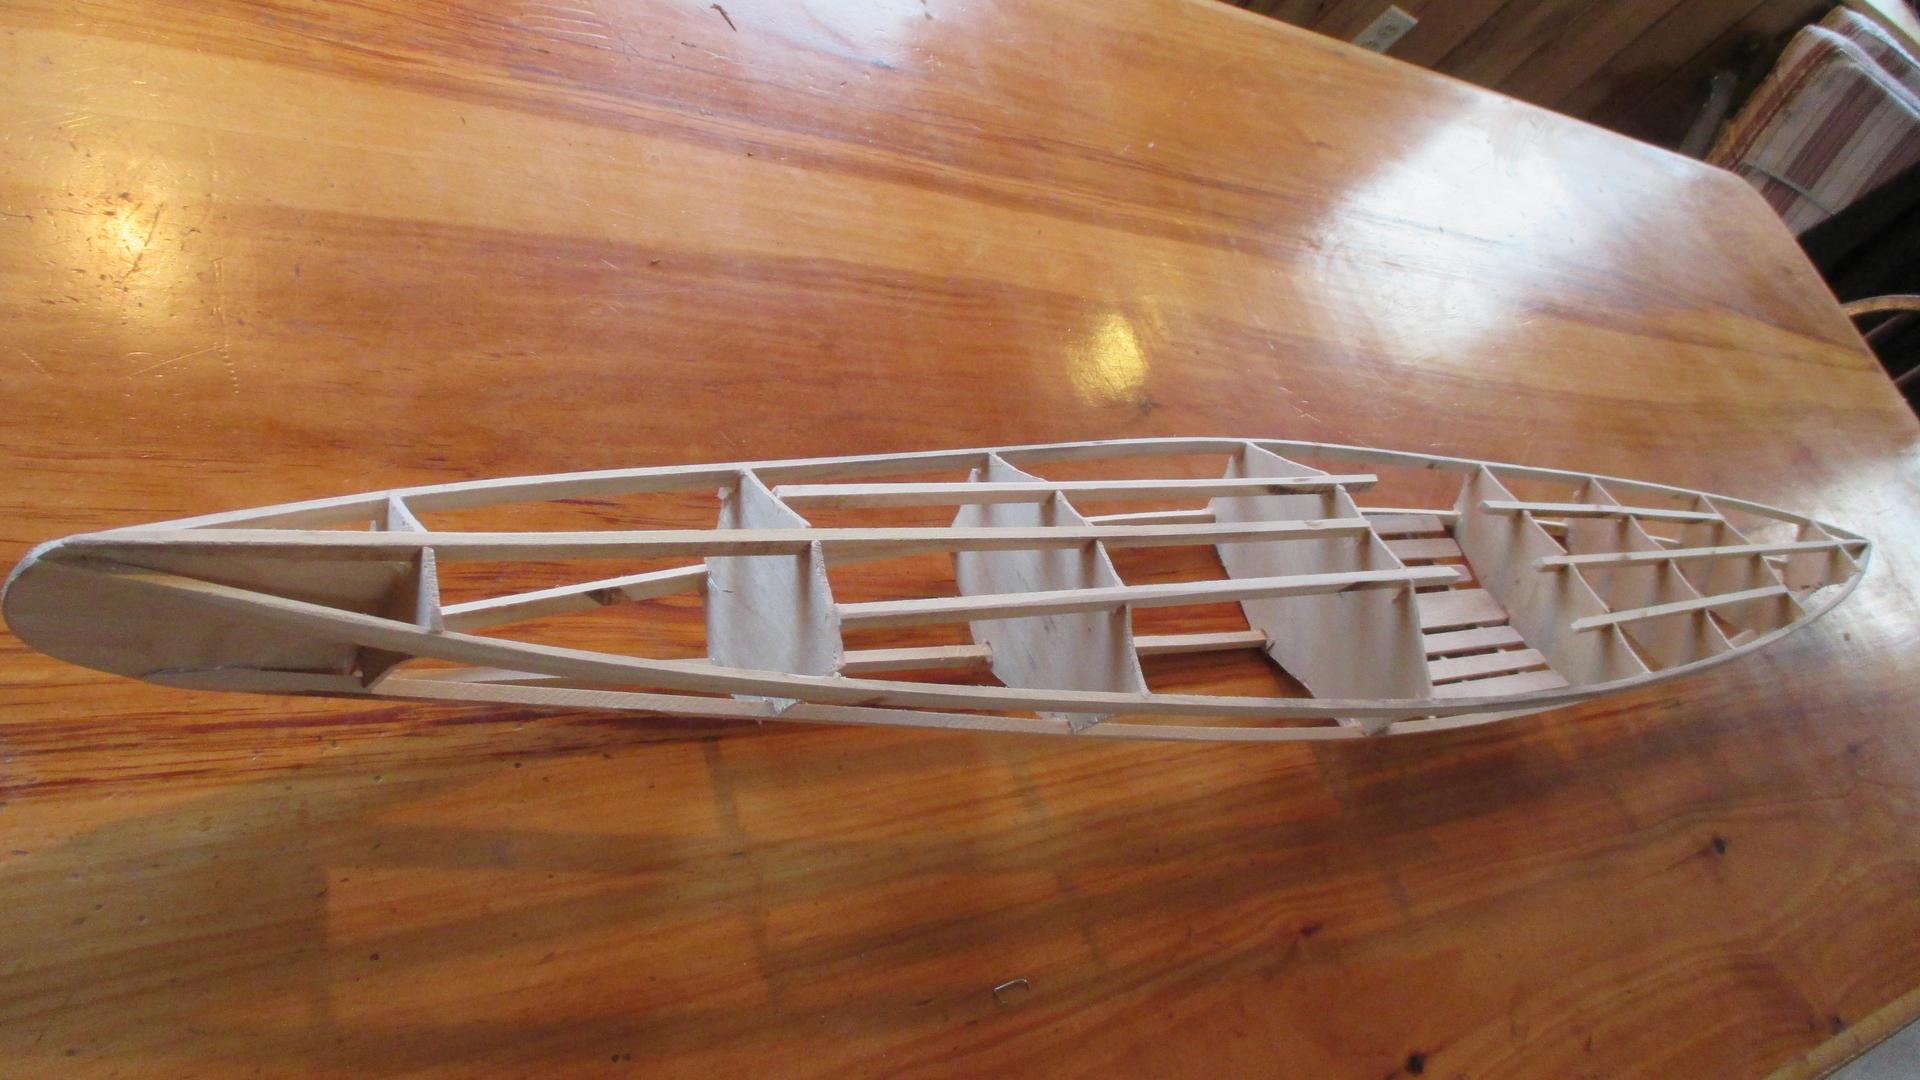 Skin on frame kayak plans - The 40 55 Skin On Frame Kayak Model Kits